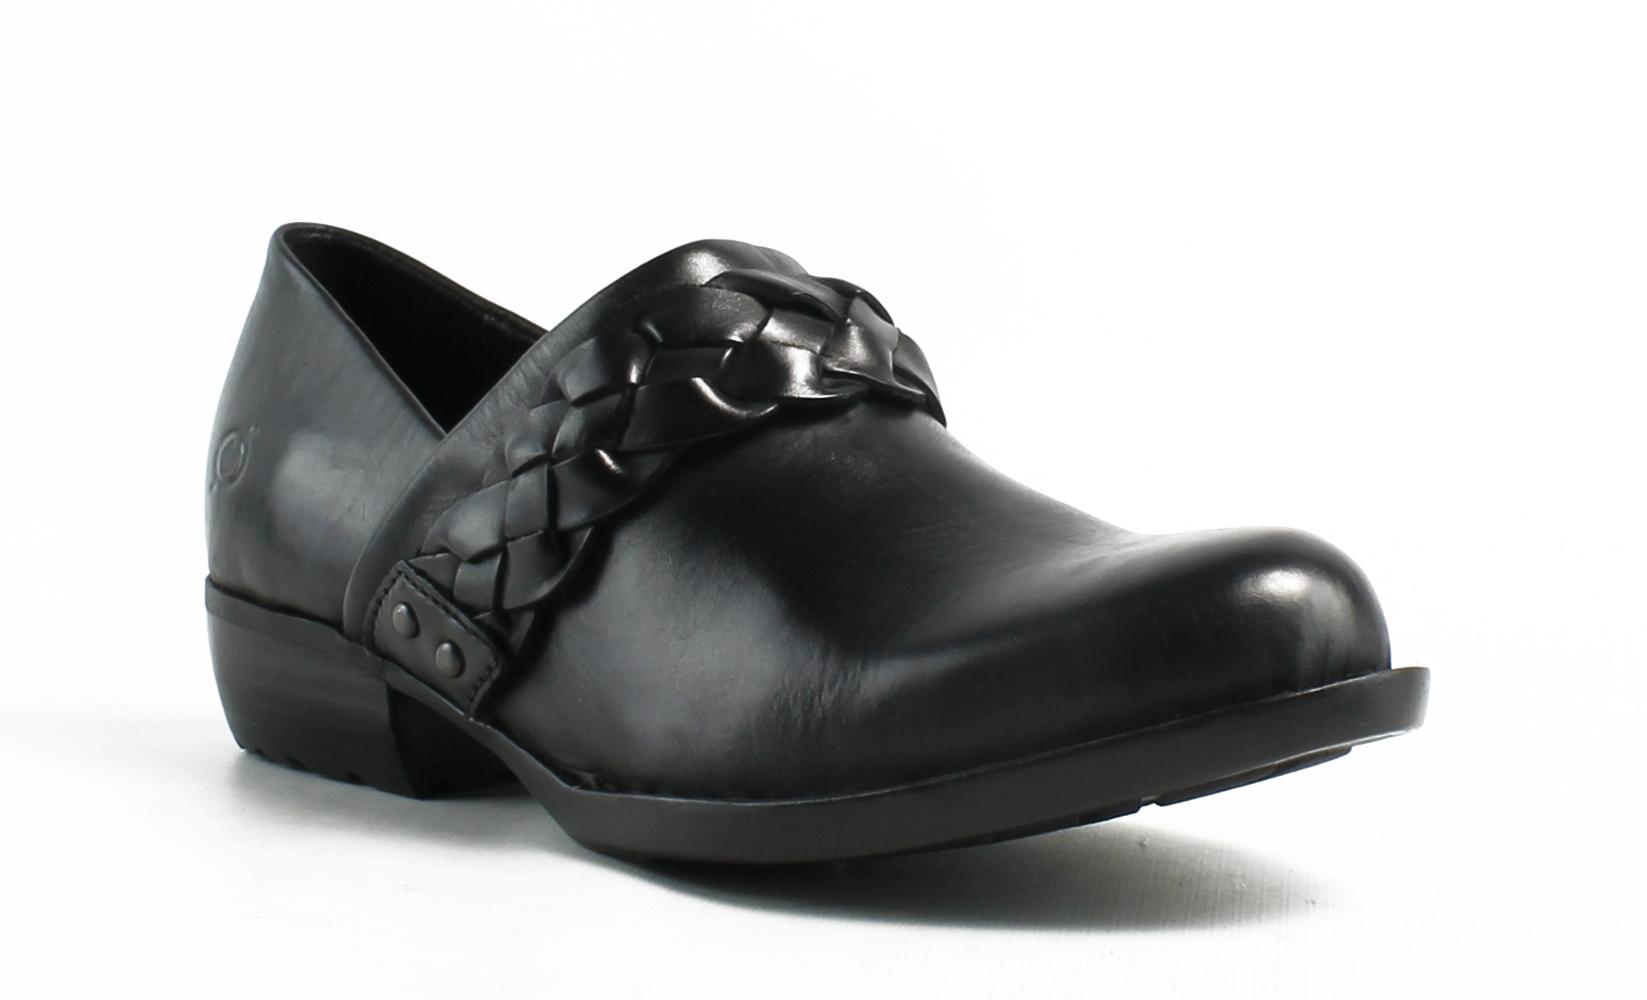 New Born Womens Black Oxfords Size 6.5